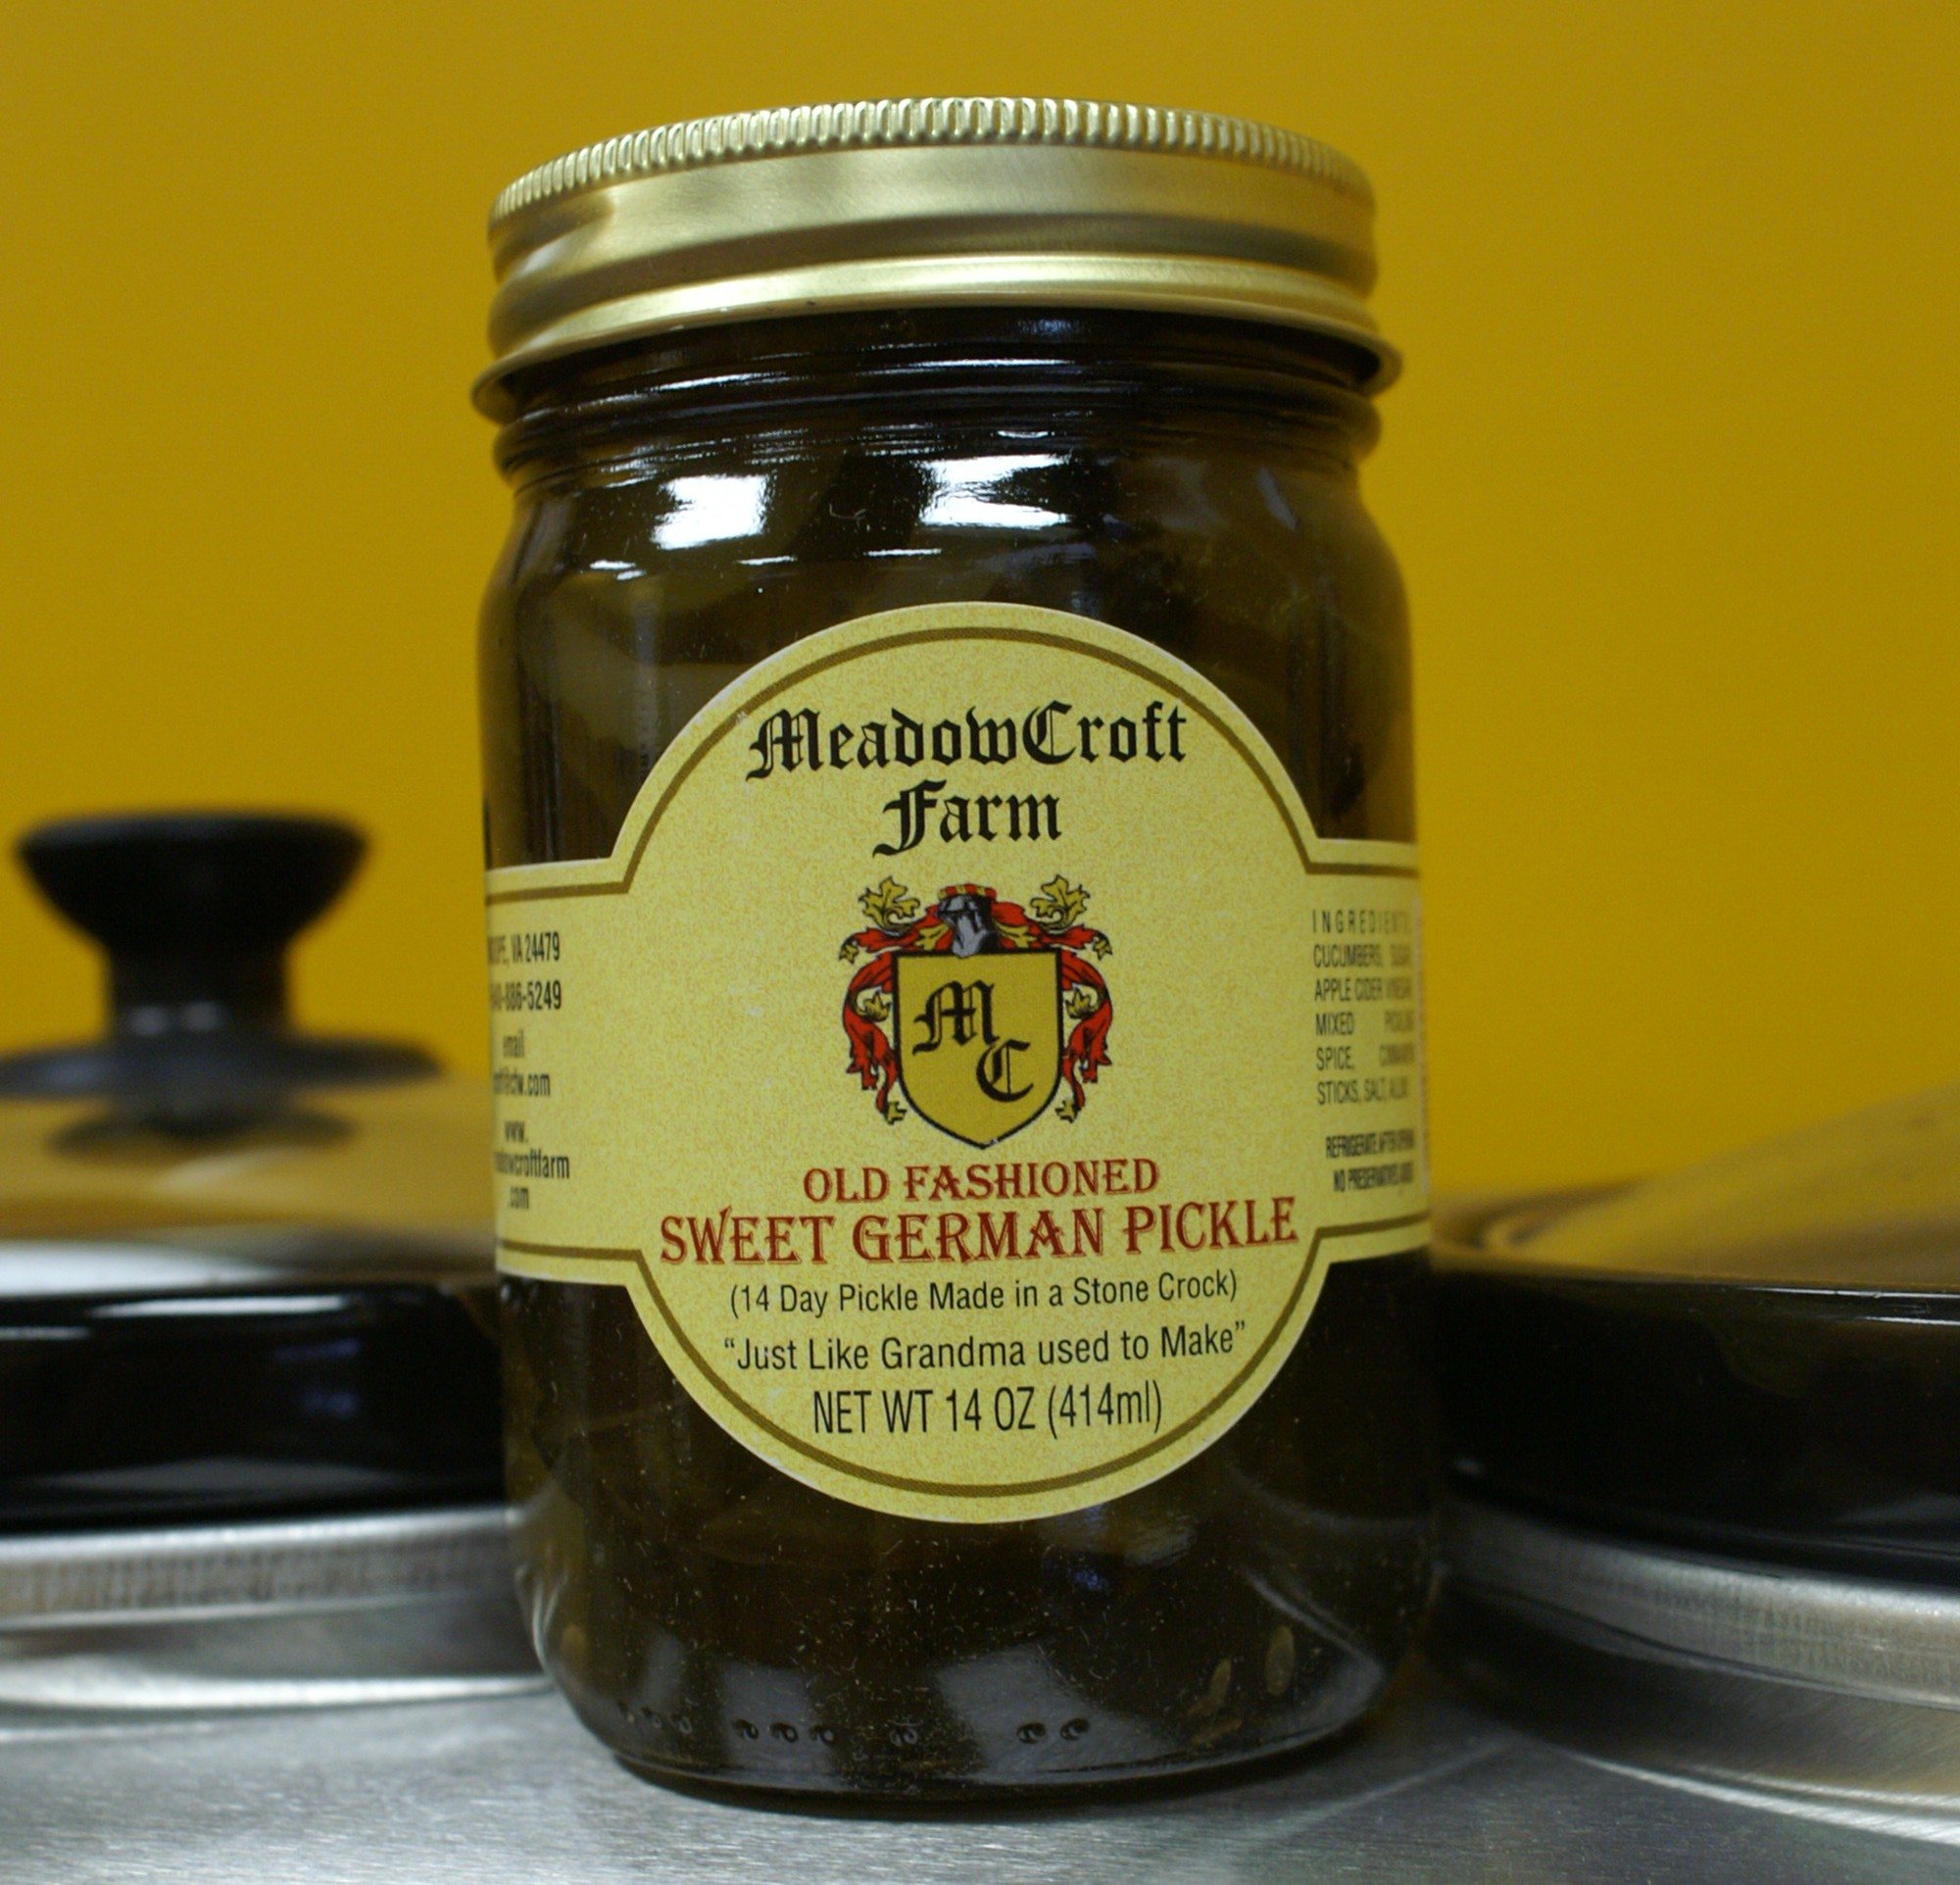 Pickles Sweet German - MeadowCroft Farm Old Fashioned Sweet German Pickles- 2 PACK 14-day barrel-aged pickle-